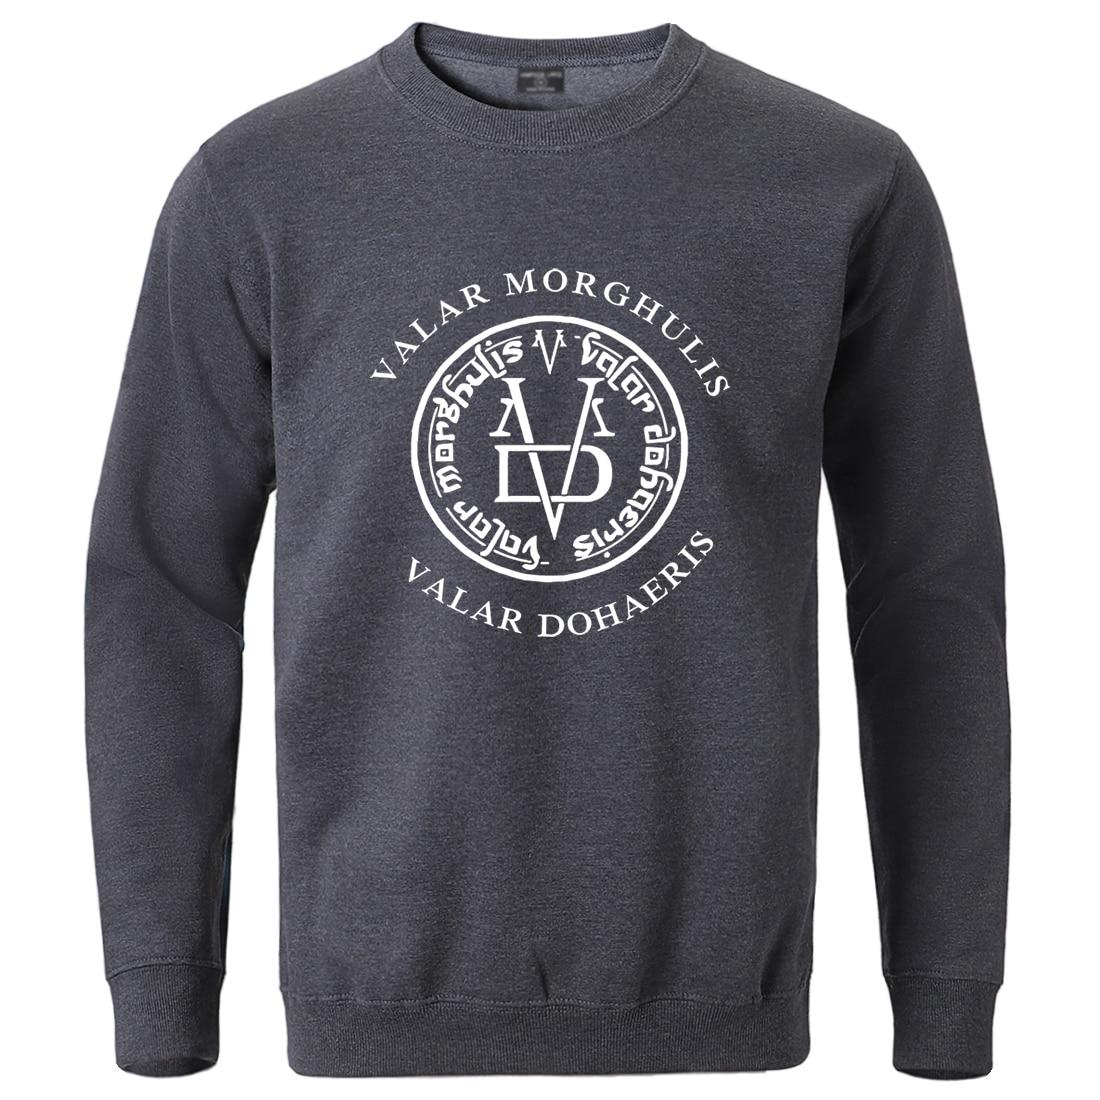 Game Of Thrones Winter Sweatshirt For Man 2020 Male Valar Morghulis Valar Dohaeris Hoodie Streetwear Fashion Cotton Crewneck Top